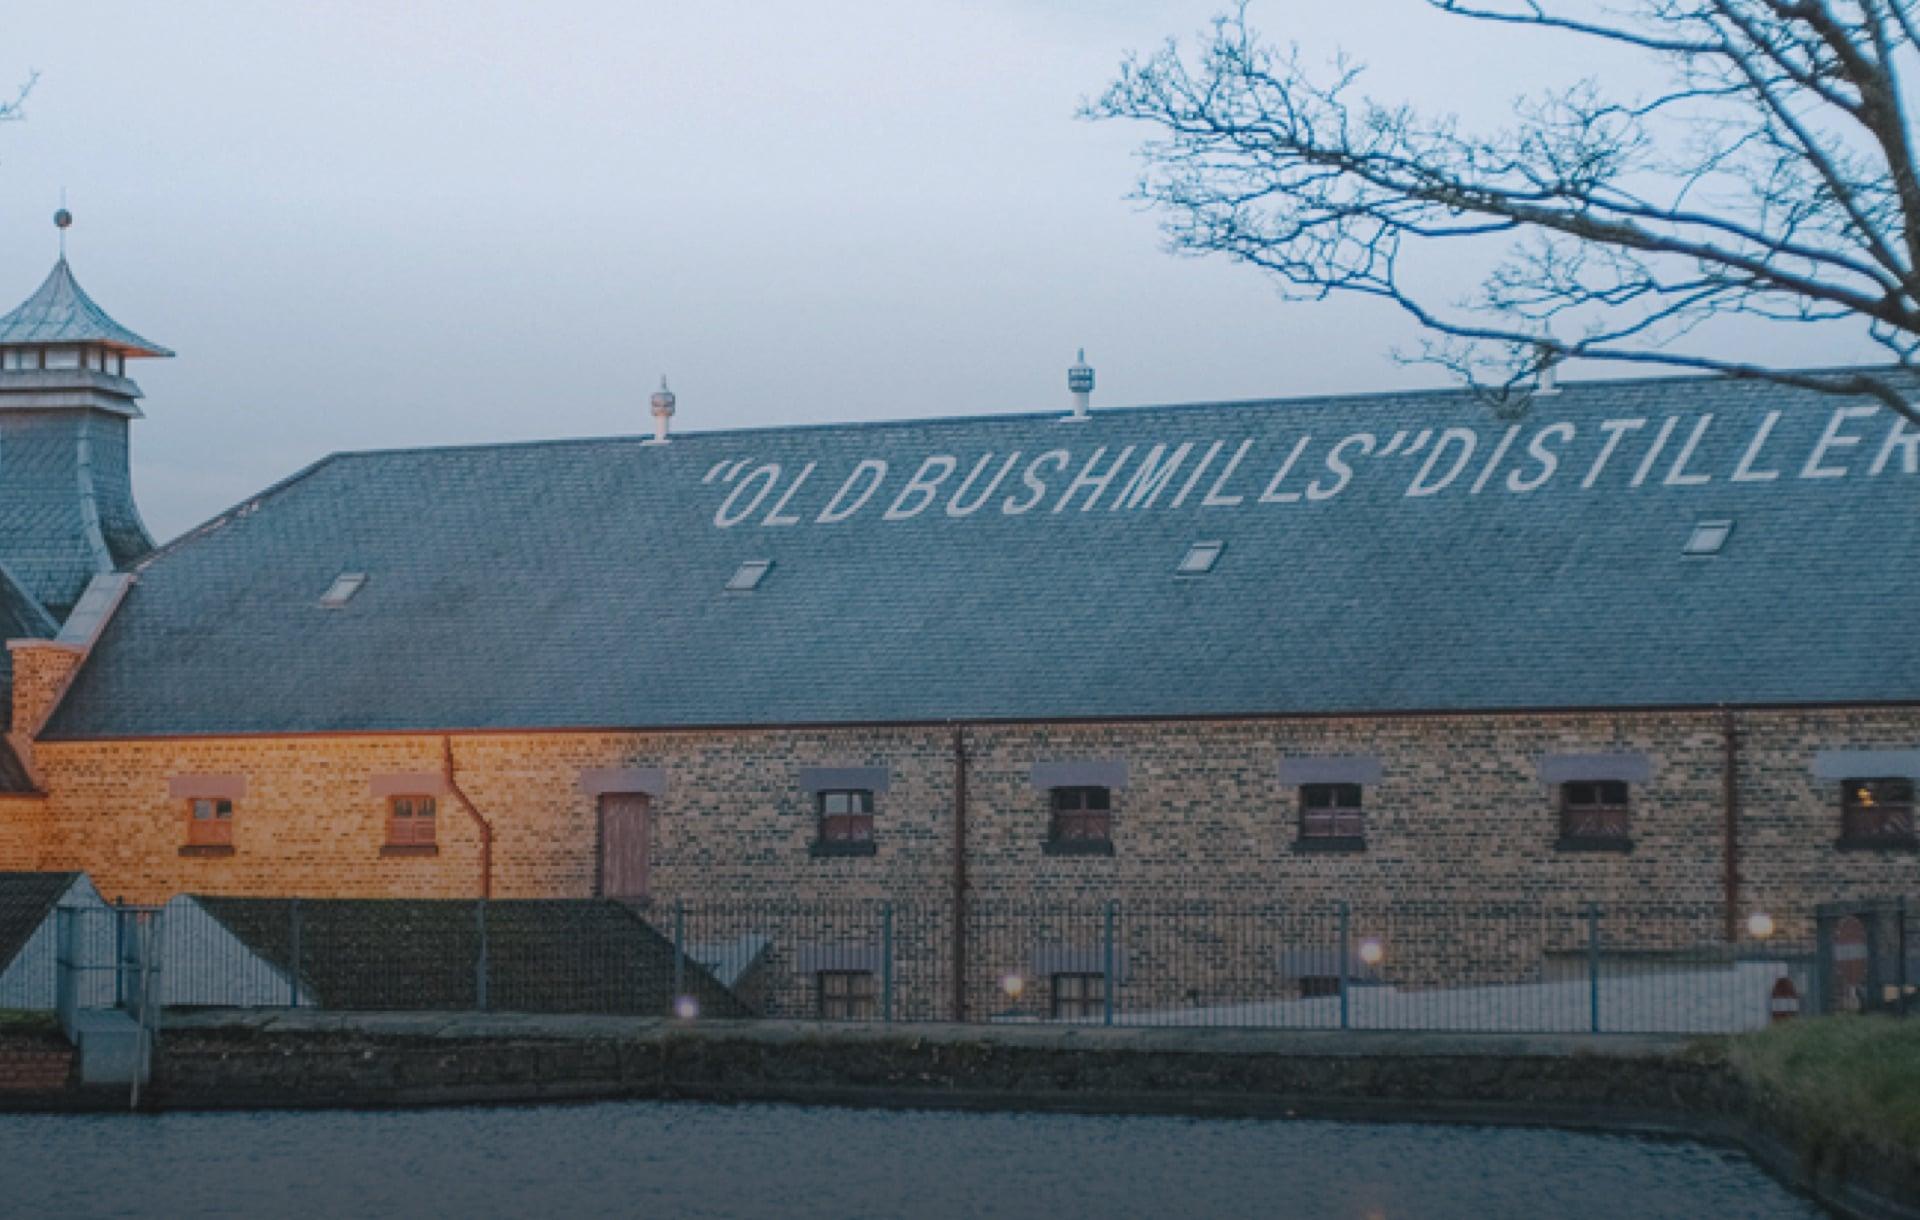 The History Of Bushmills Whiskey